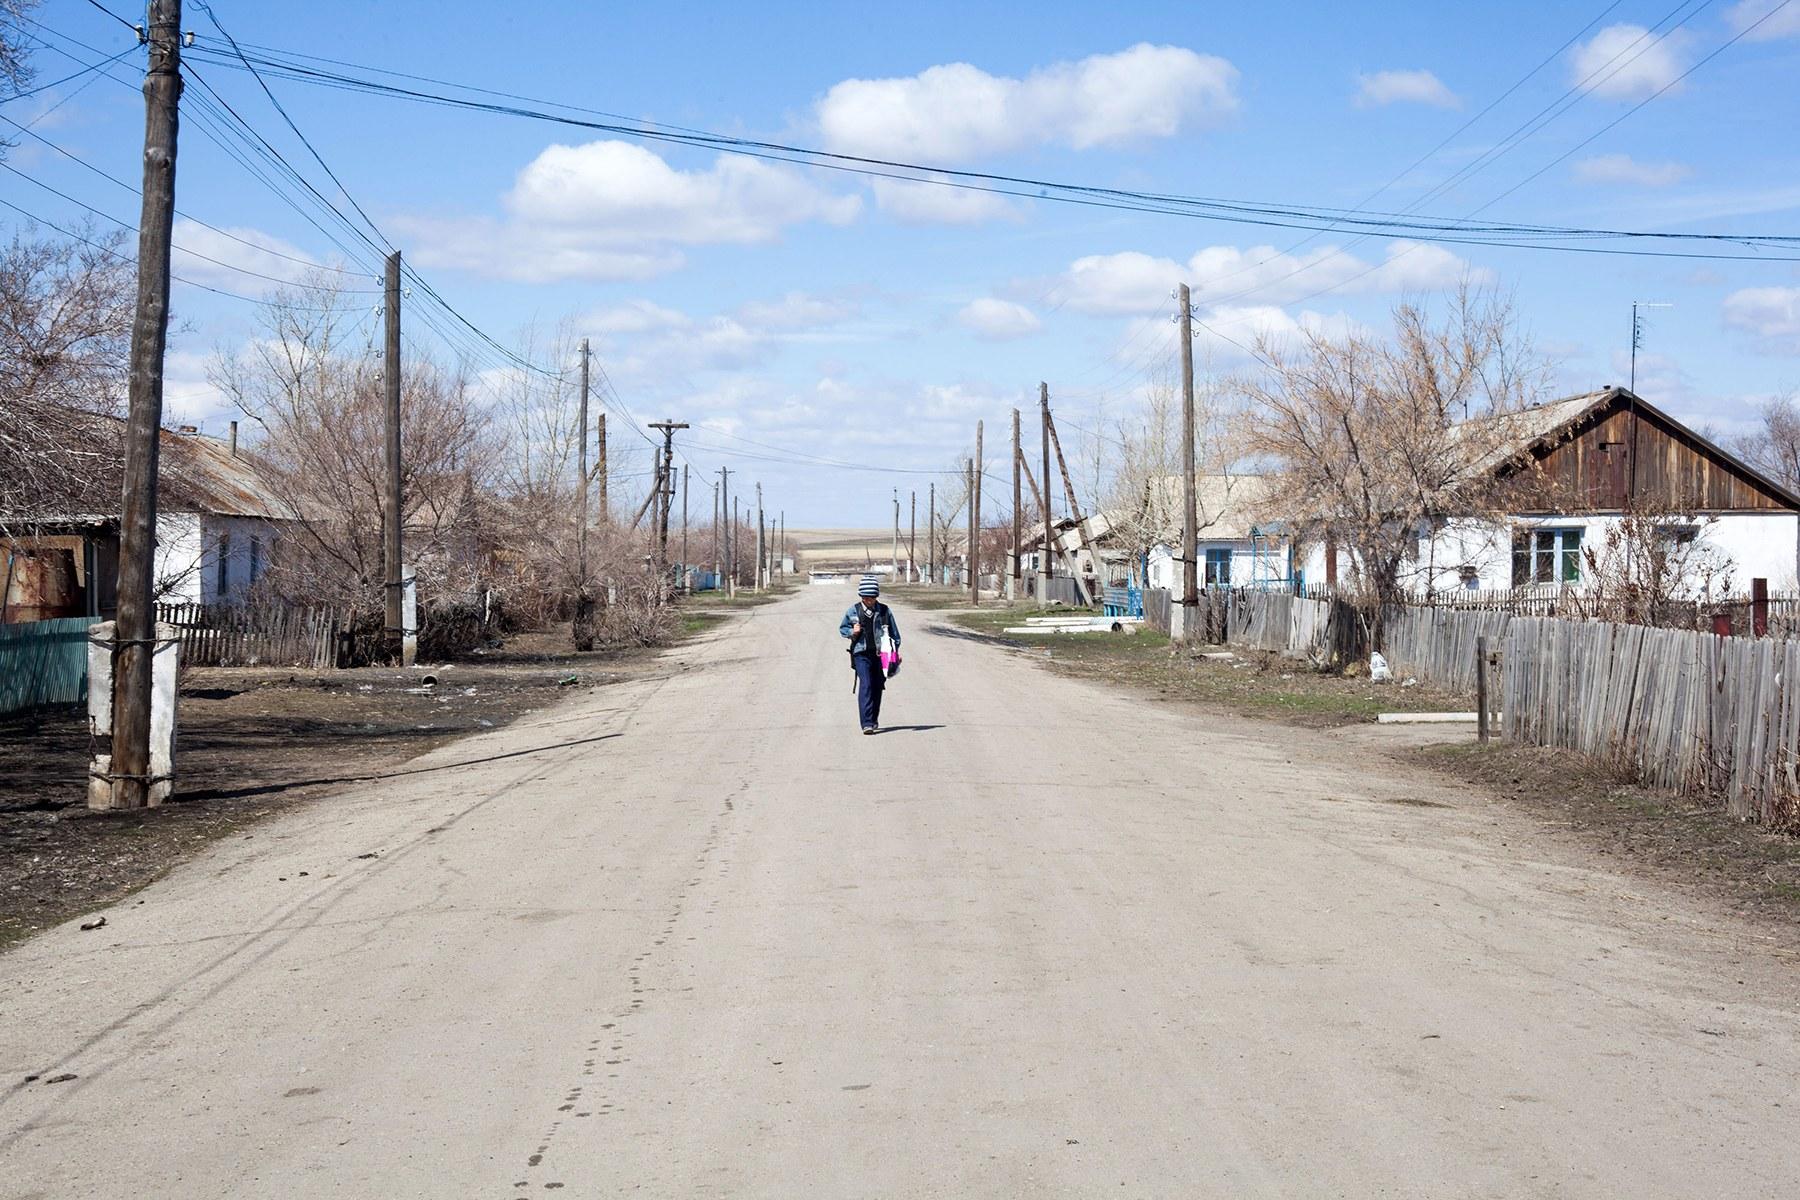 Foto: Vera Salnitskaya / The Siberian Times, www.wired.com